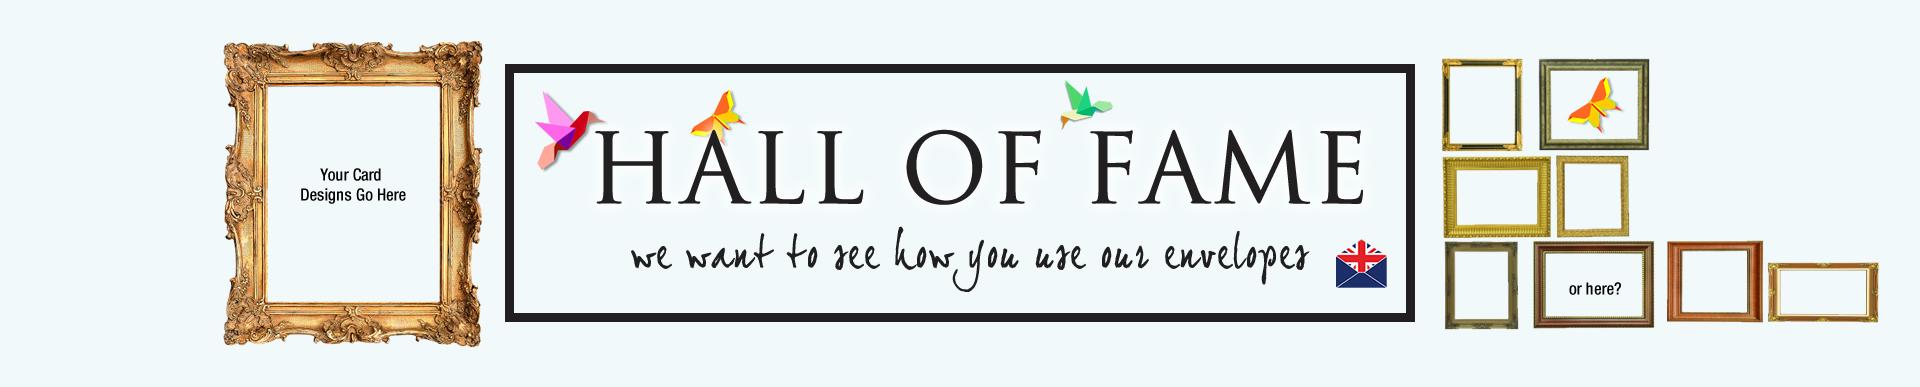 Yorkshire Envelopes Hall of Fame